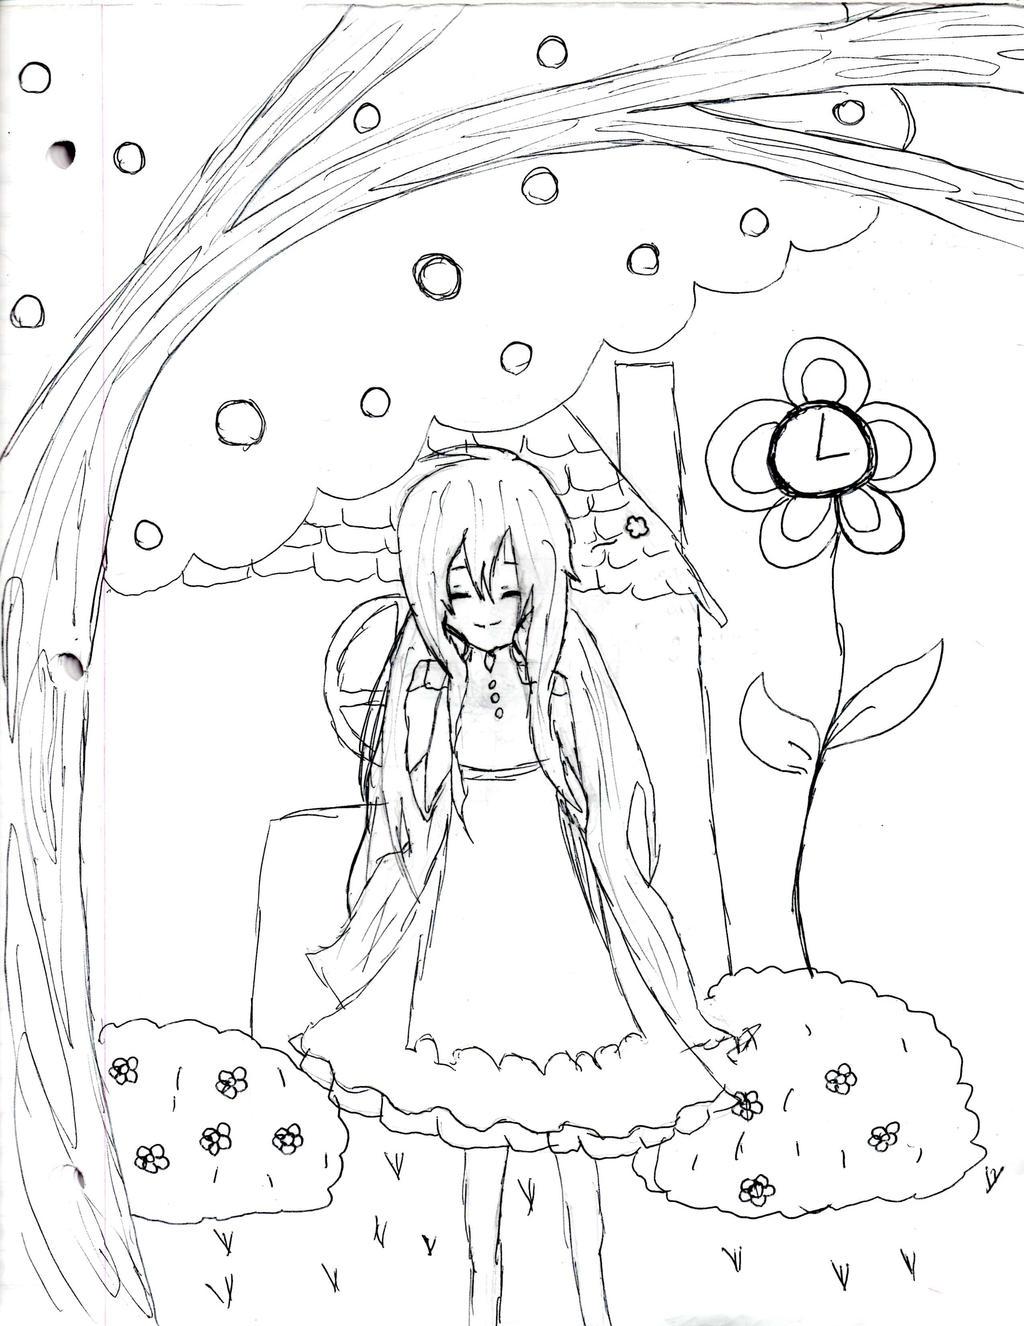 leapfrog coloring pages imagination desk - photo#36